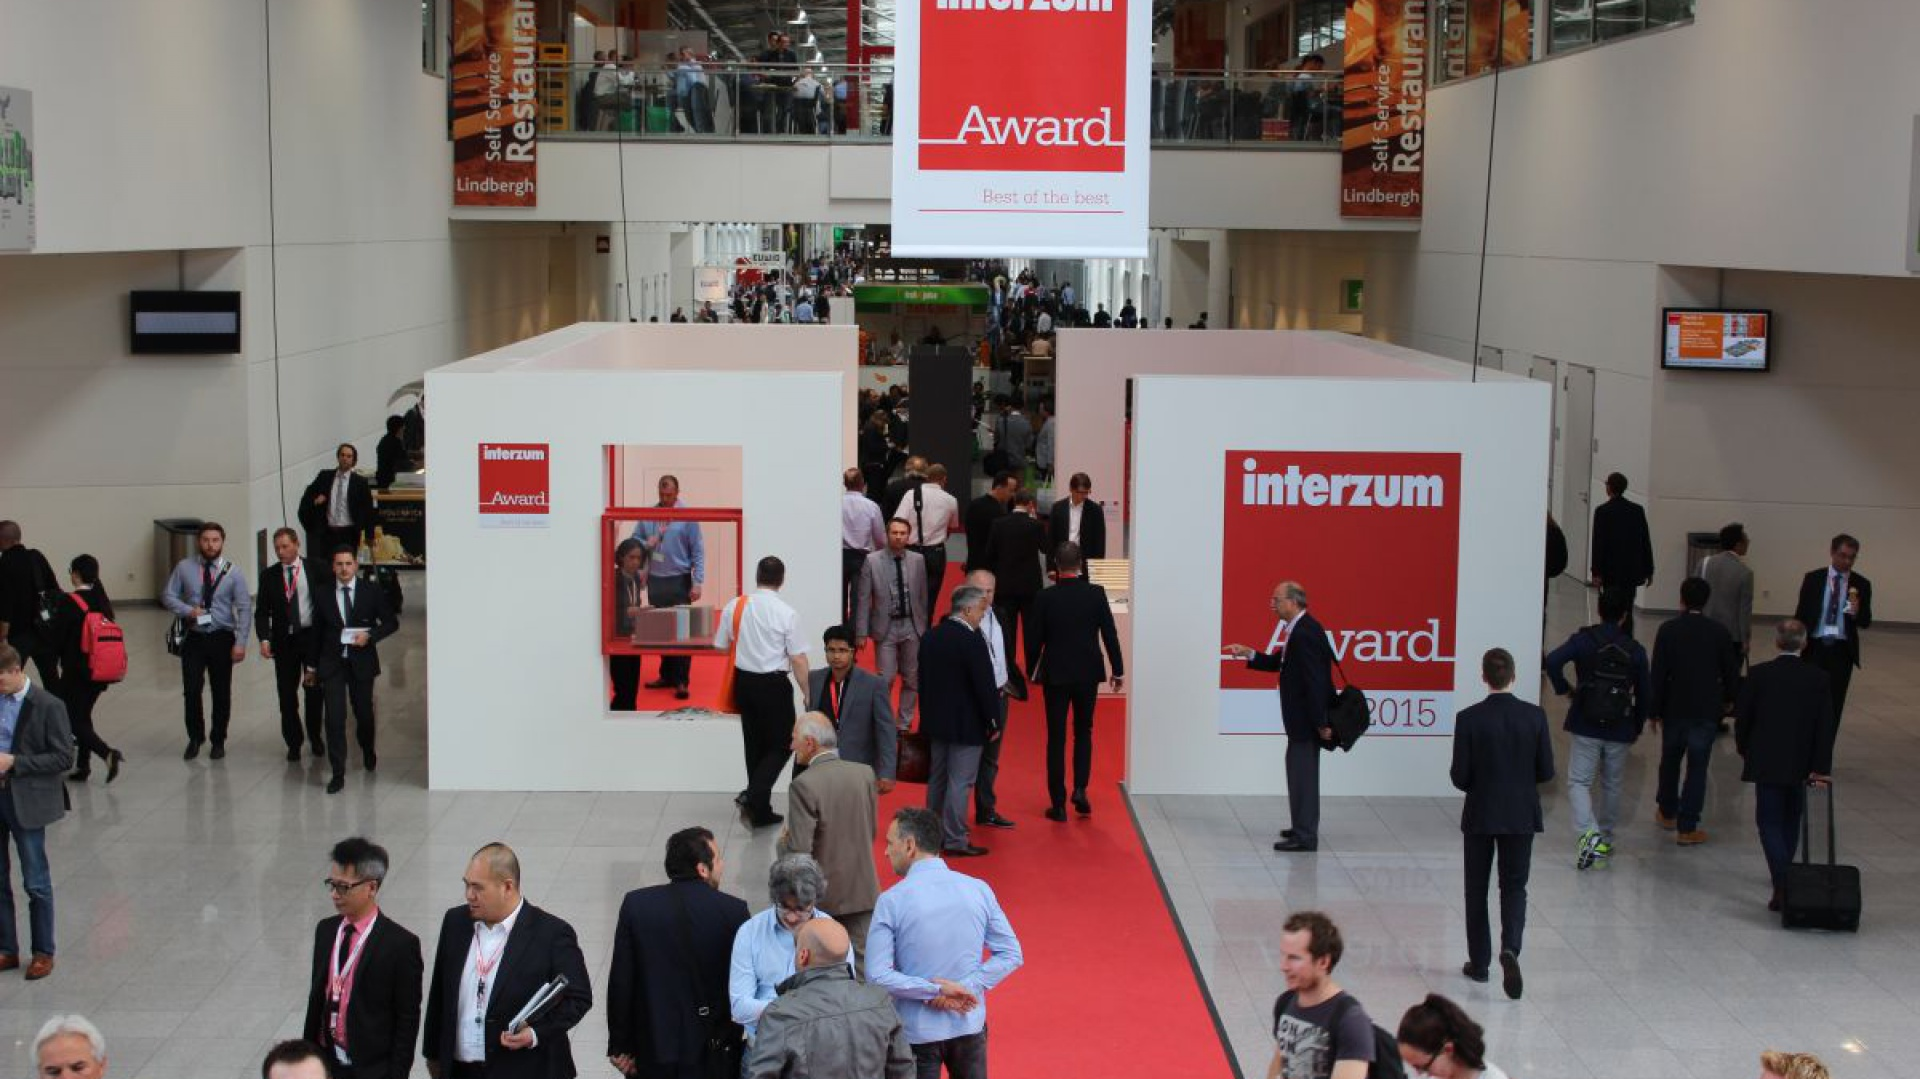 Rozstrzygnięto konkurs interzum award: intelligent material & design 2015. Fot. Mariusz Golak